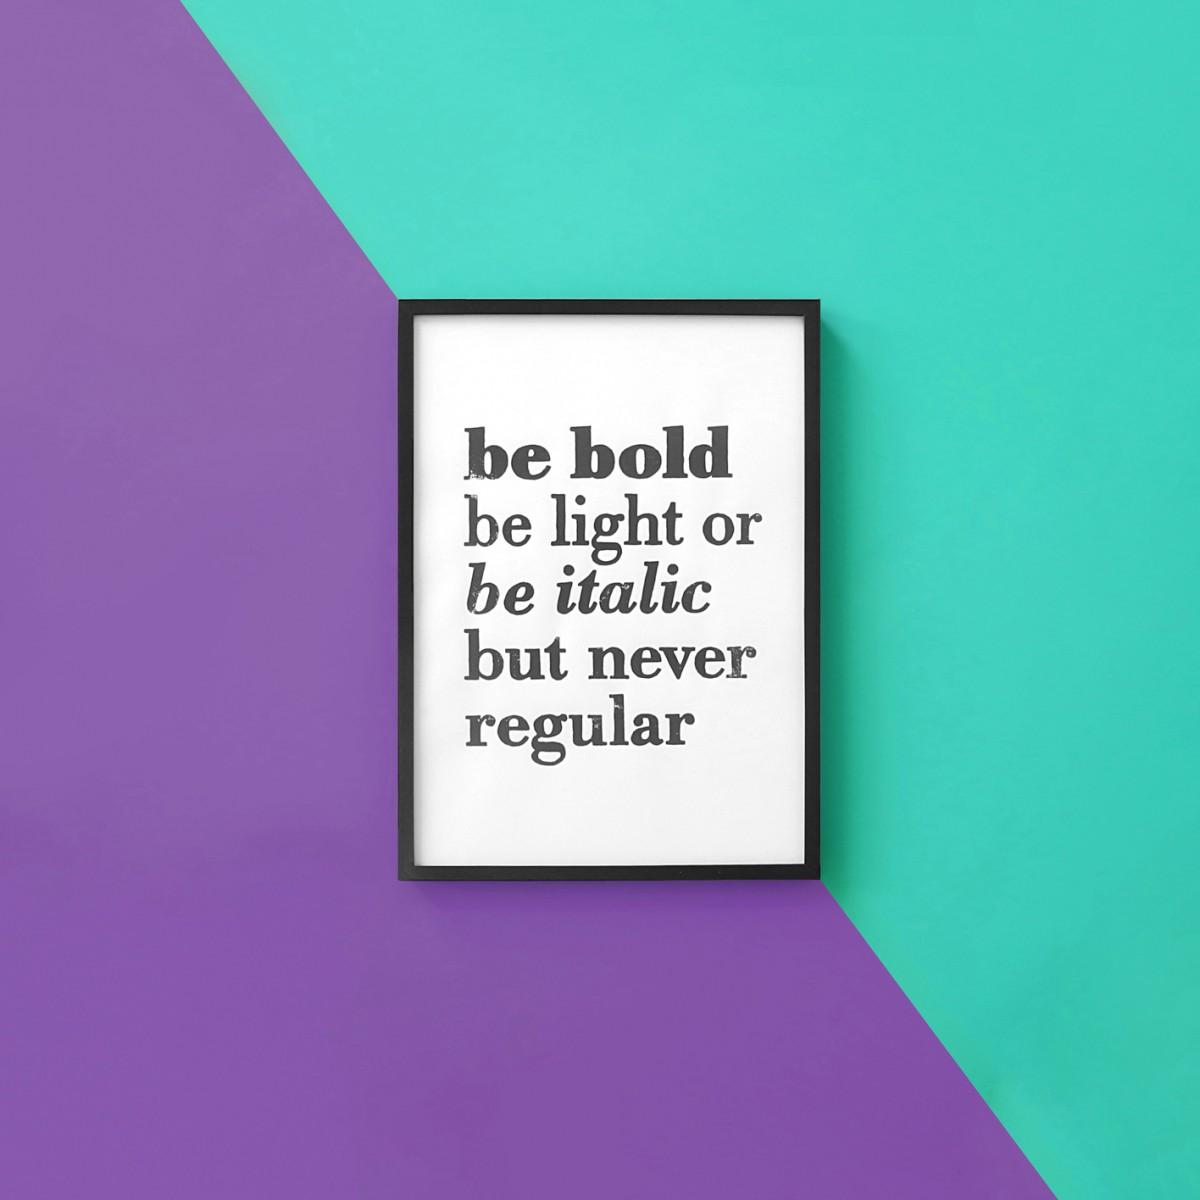 The True Type Linoldruck »Be bold, be light or be italic but never regular«, gerahmt (DIN A4), Poster, Print, Typografie, Design